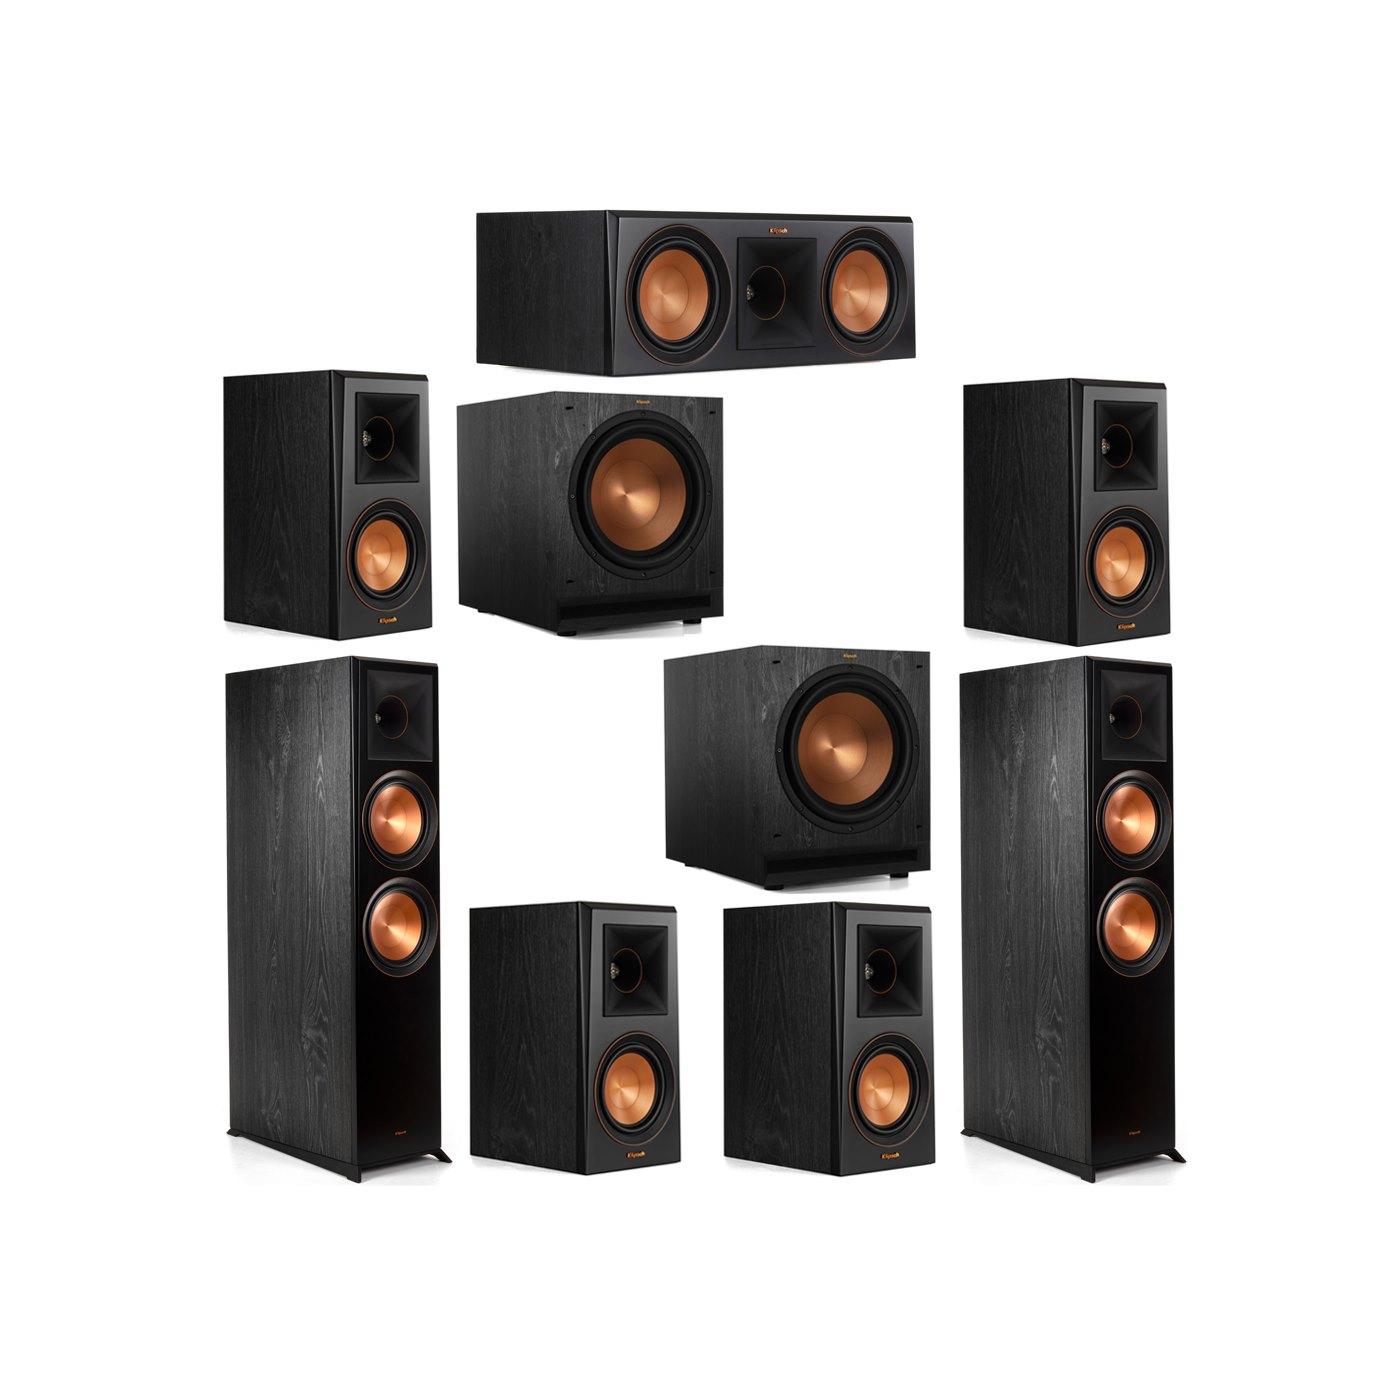 Klipsch 7.2 System with 2 RP-8000F Floorstanding Speakers, 1 Klipsch RP-600C Center Speaker, 4 Klipsch RP-500M Surround Speakers, 2 Klipsch SPL-120 Subwoofers